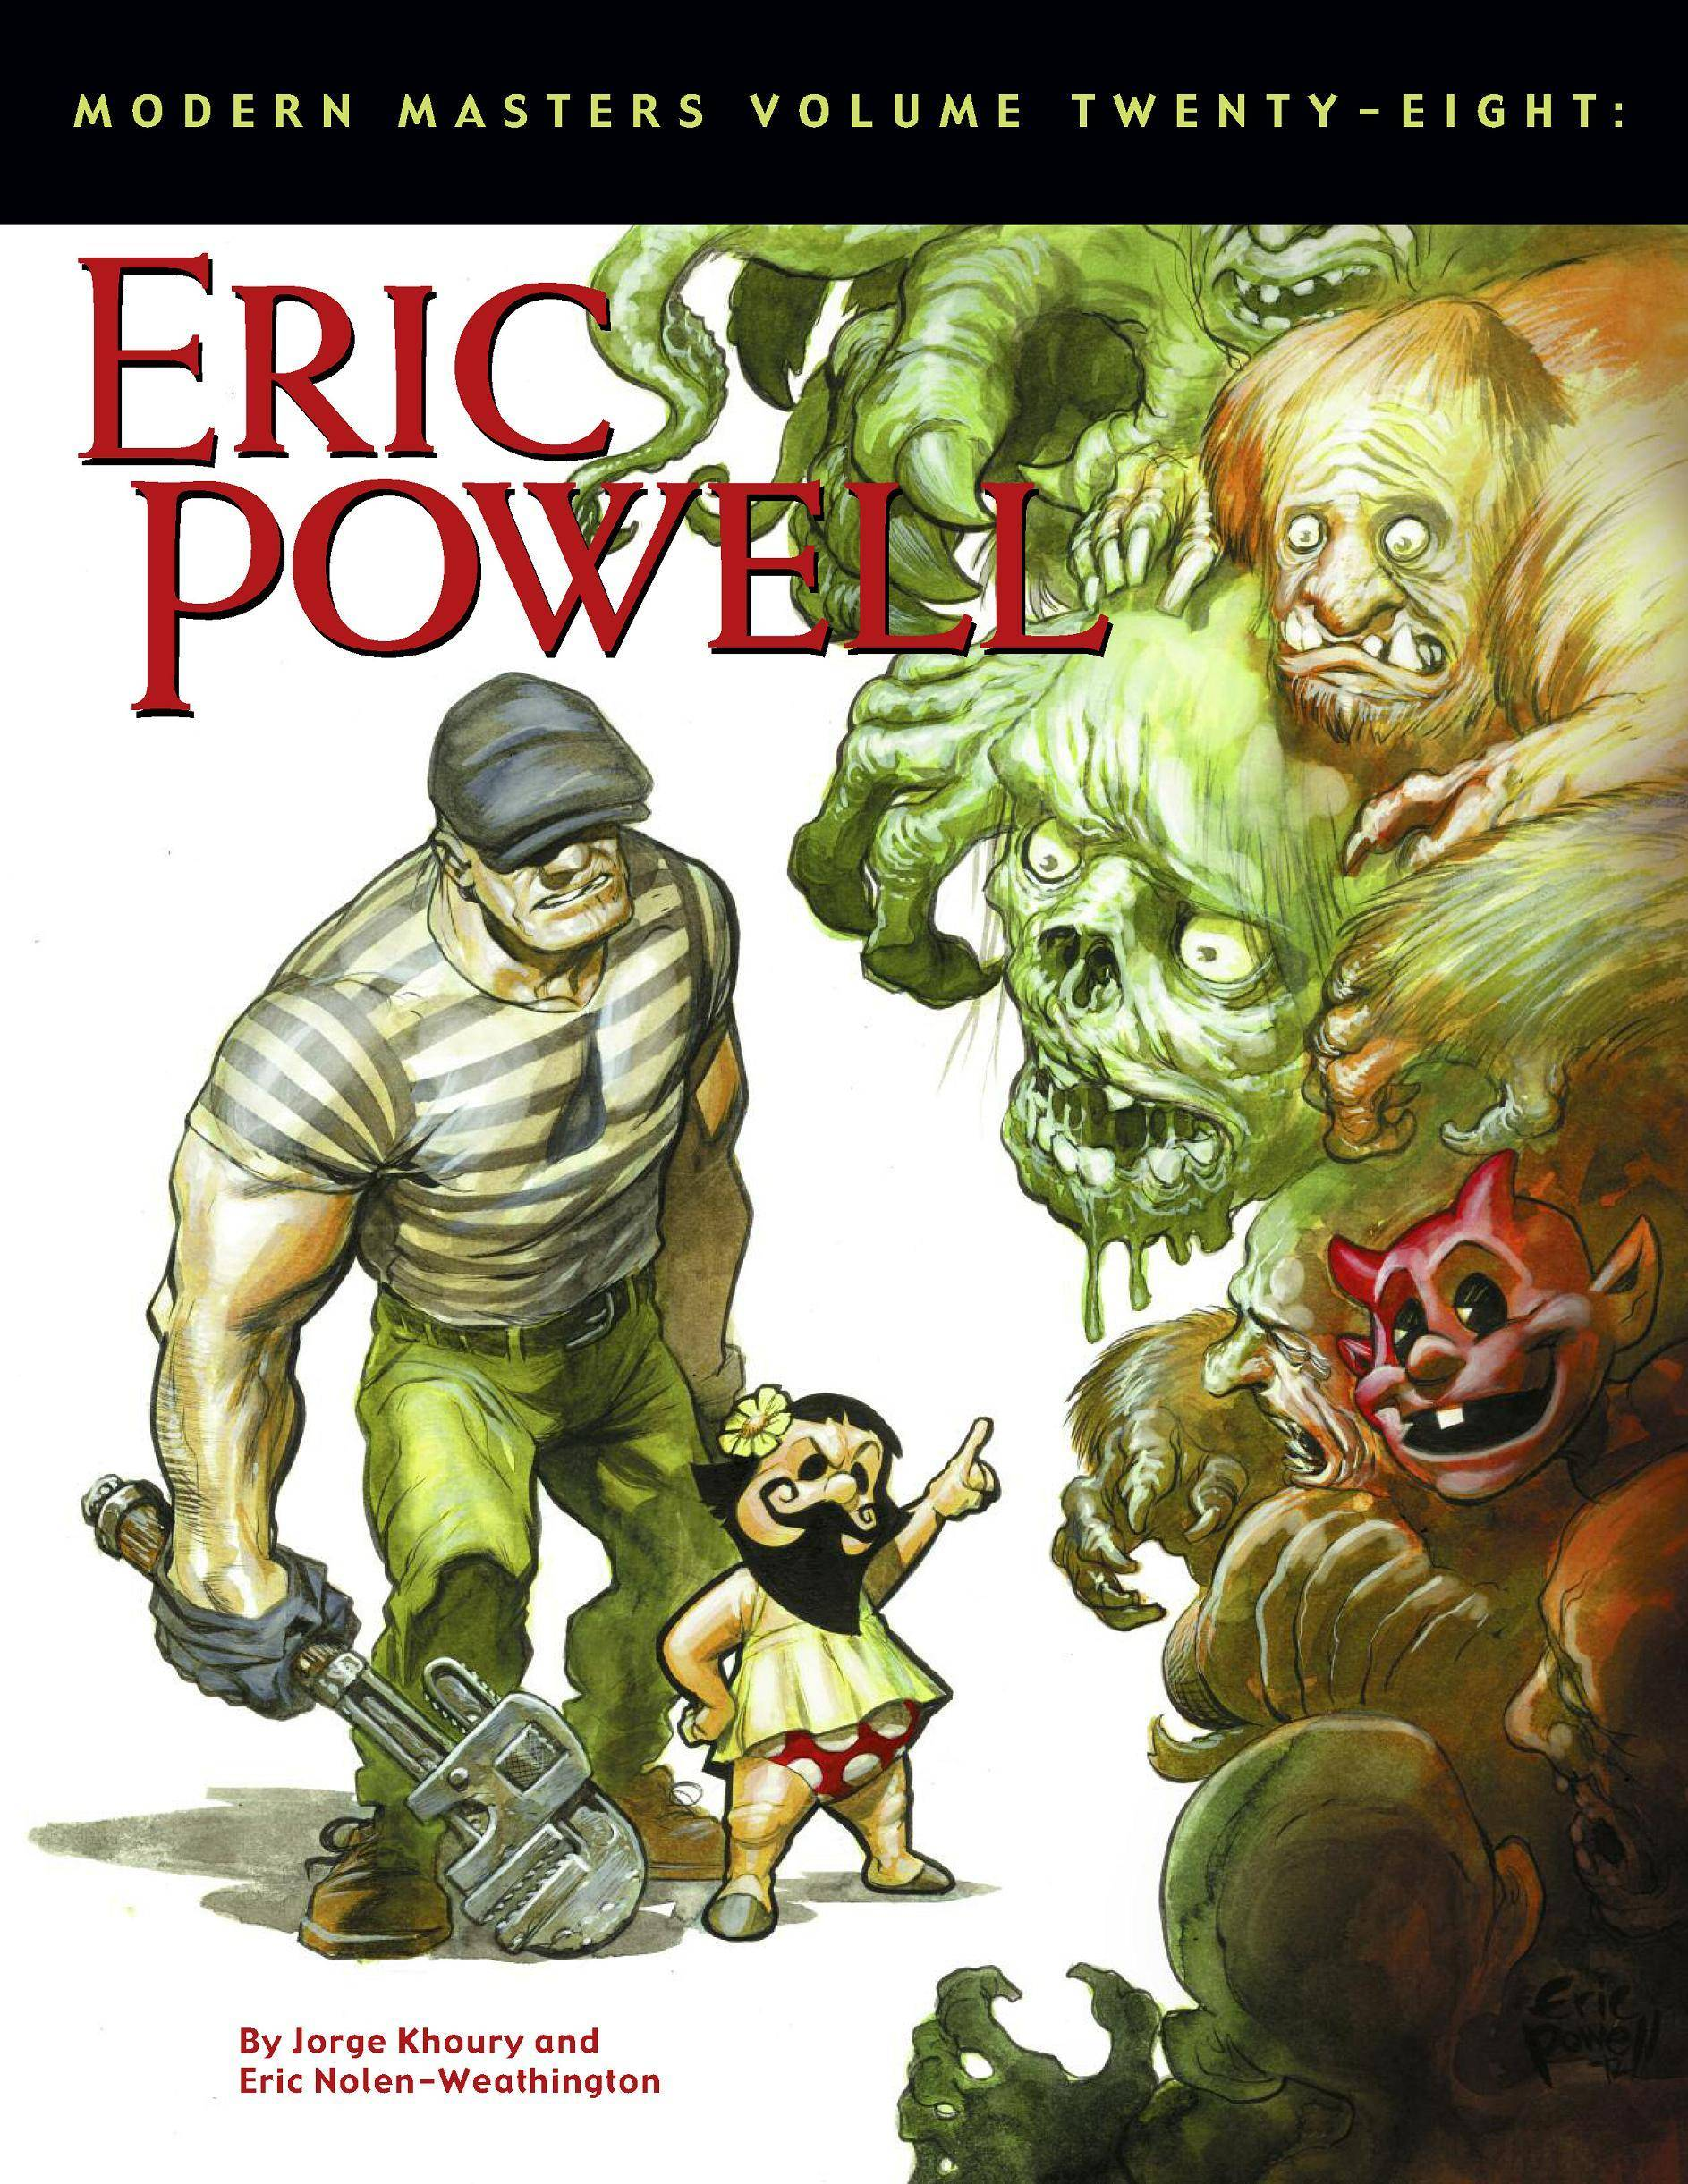 Modern Masters Vol 28 - Eric Powell 2012 Project Ozma